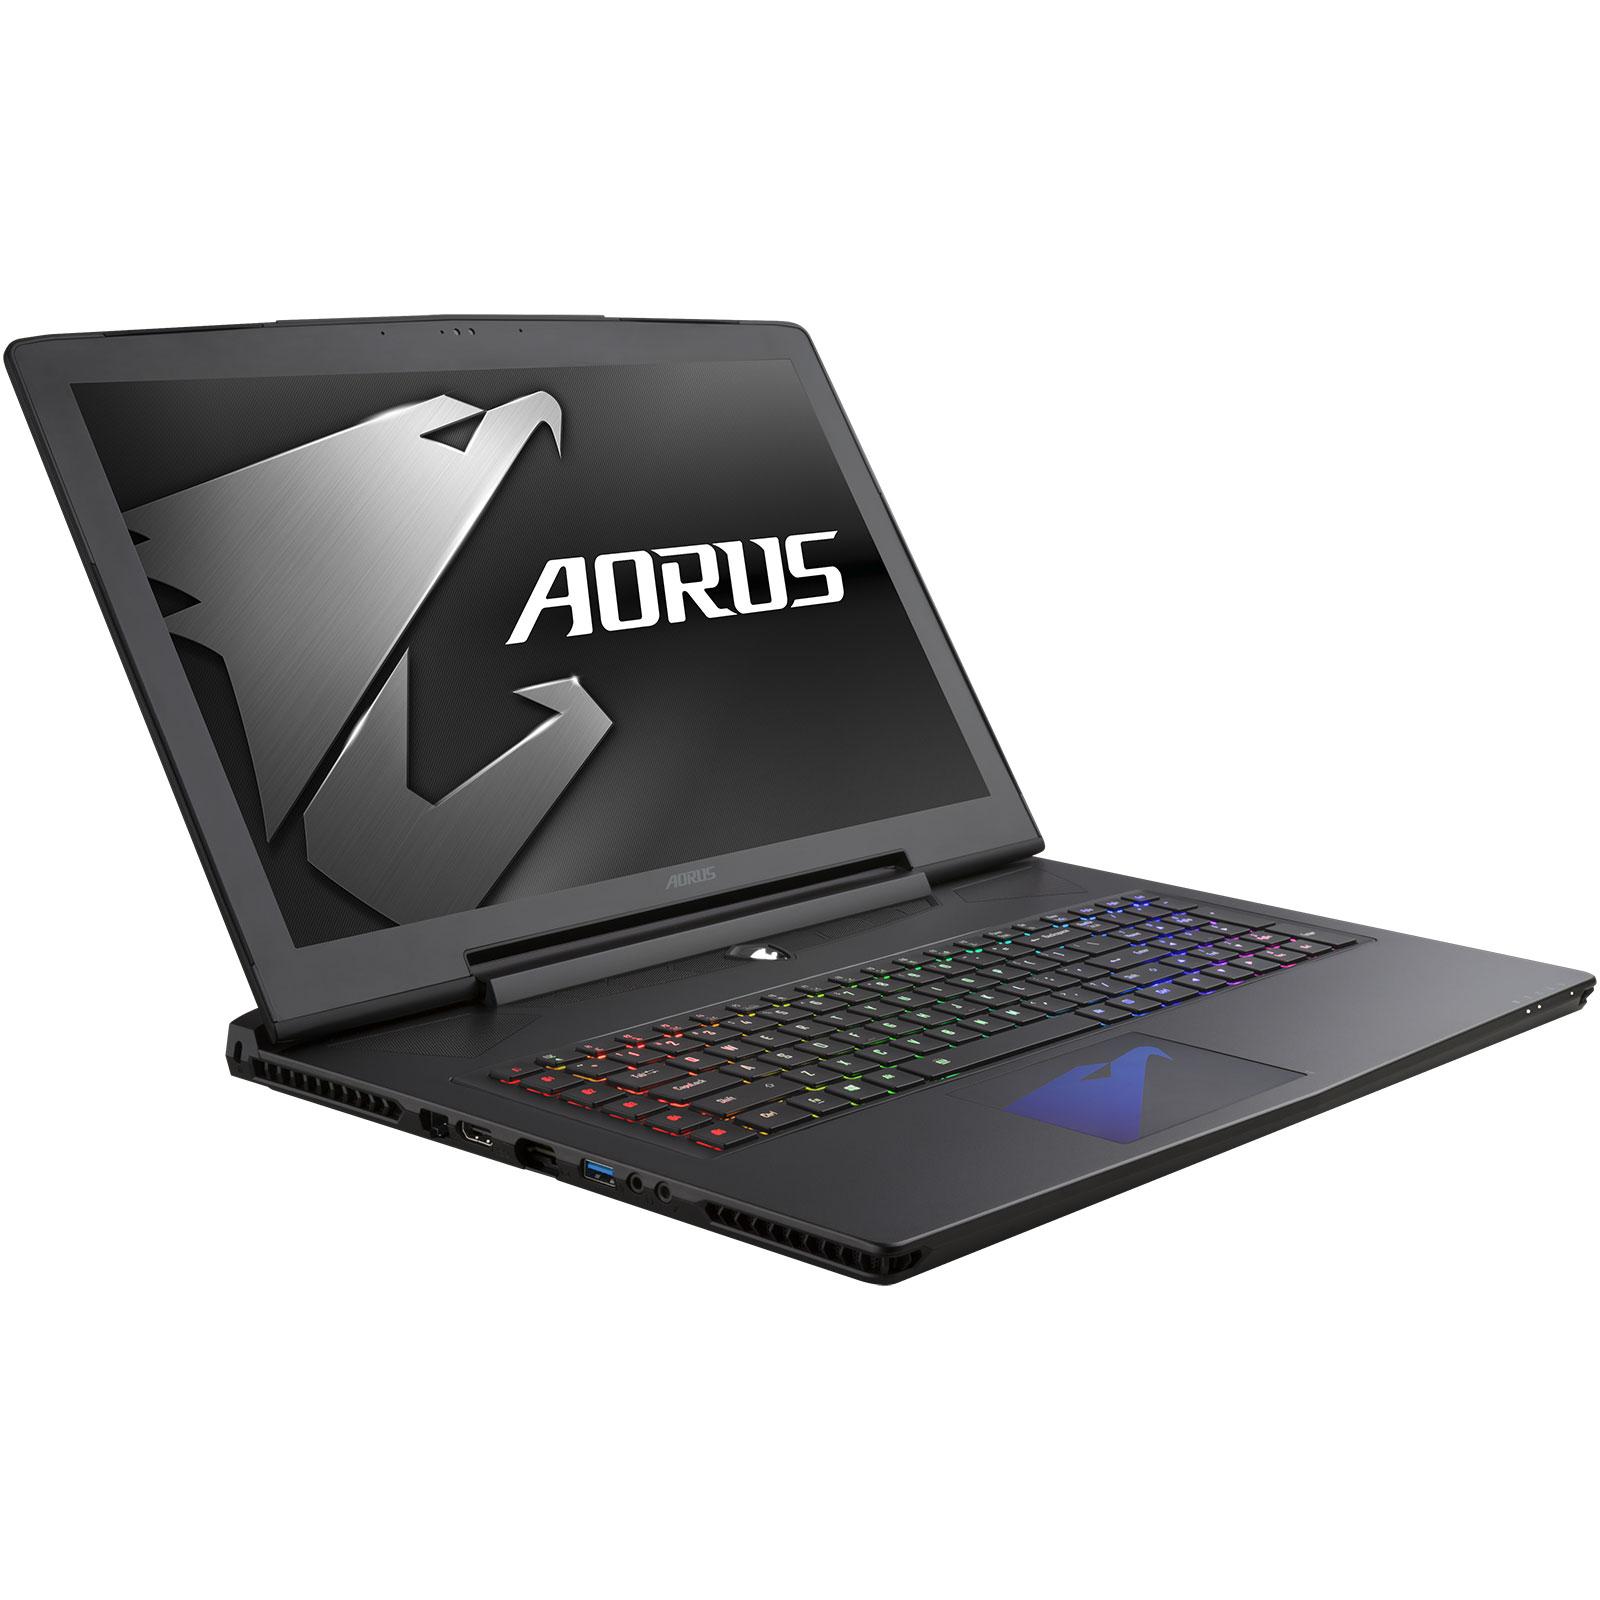 PC portable Aorus X5 v6  K1NW10-FR - i7-6820HK, 16 Go, GTX 1070 8 Go, Ecran 3k, SSD 256 Go